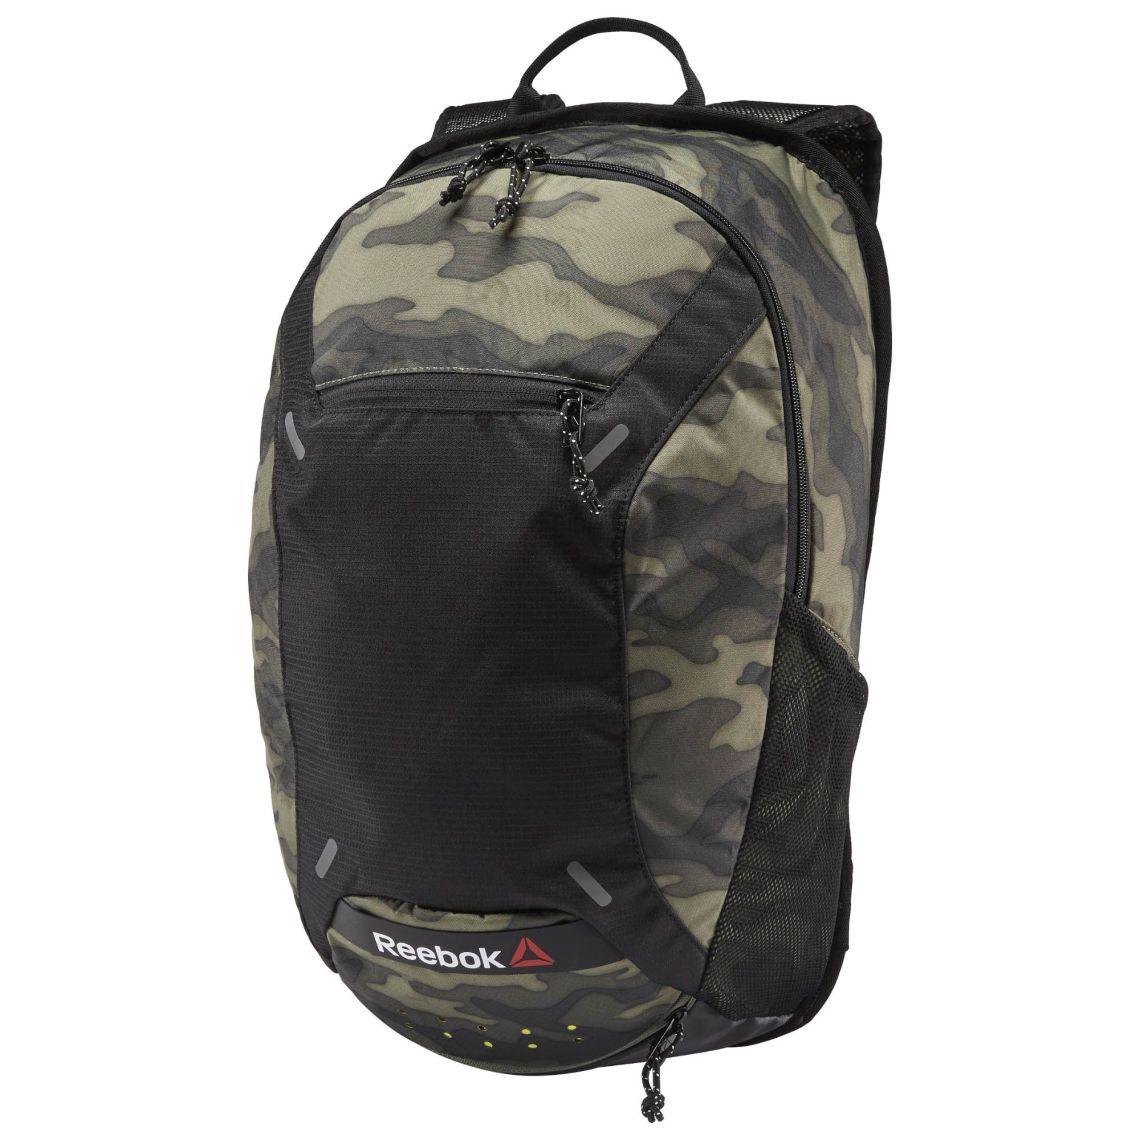 24l Army Bags - 4811397_e2421766-08e3-4182-9ffb-1c09e58fab23_2000_2000_Download 24l Army Bags - 4811397_e2421766-08e3-4182-9ffb-1c09e58fab23_2000_2000  Snapshot_697949.jpg